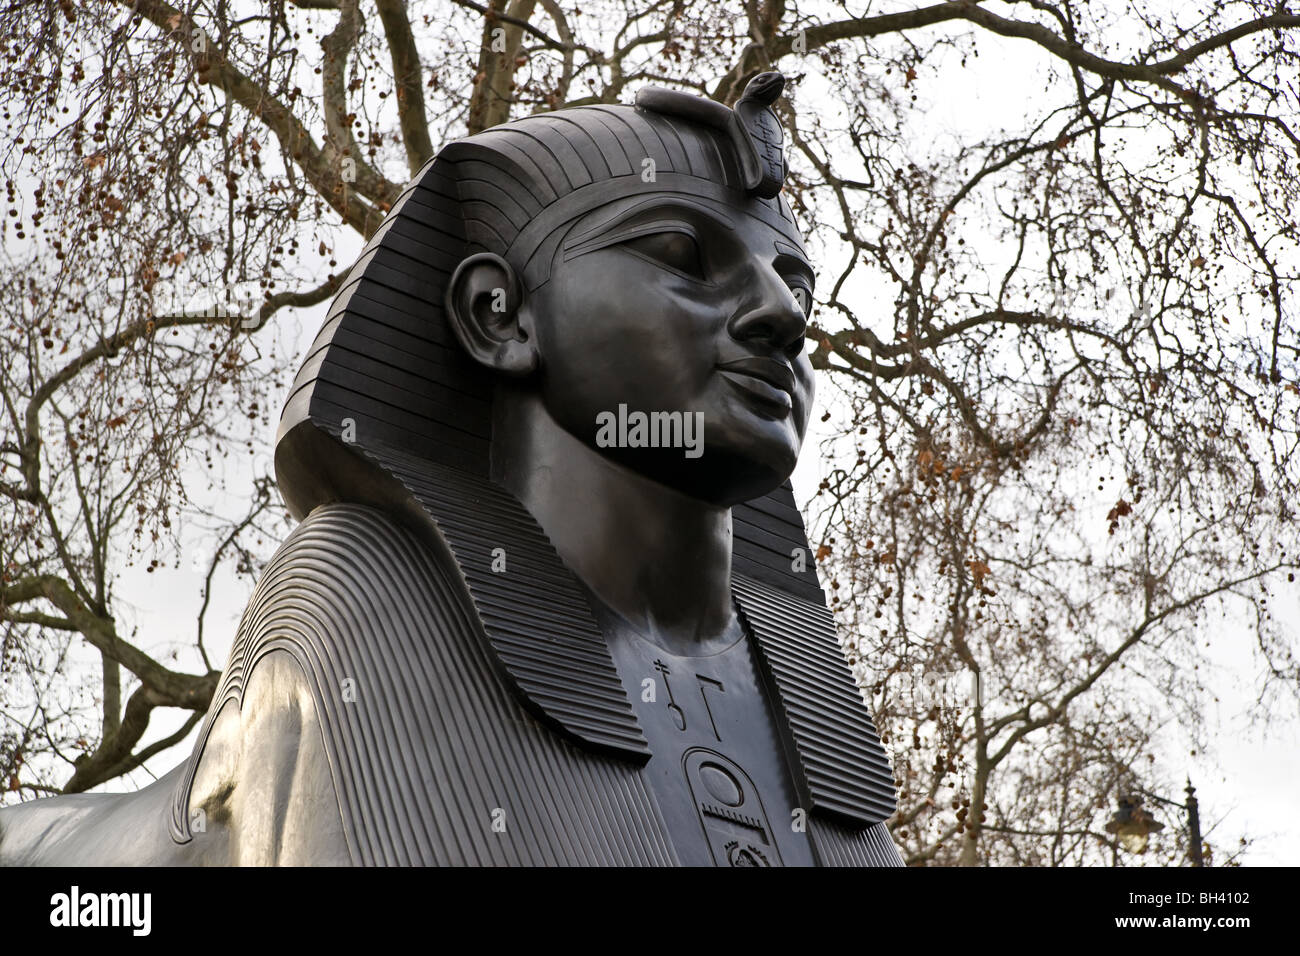 London Embankment Sphynx - Stock Image